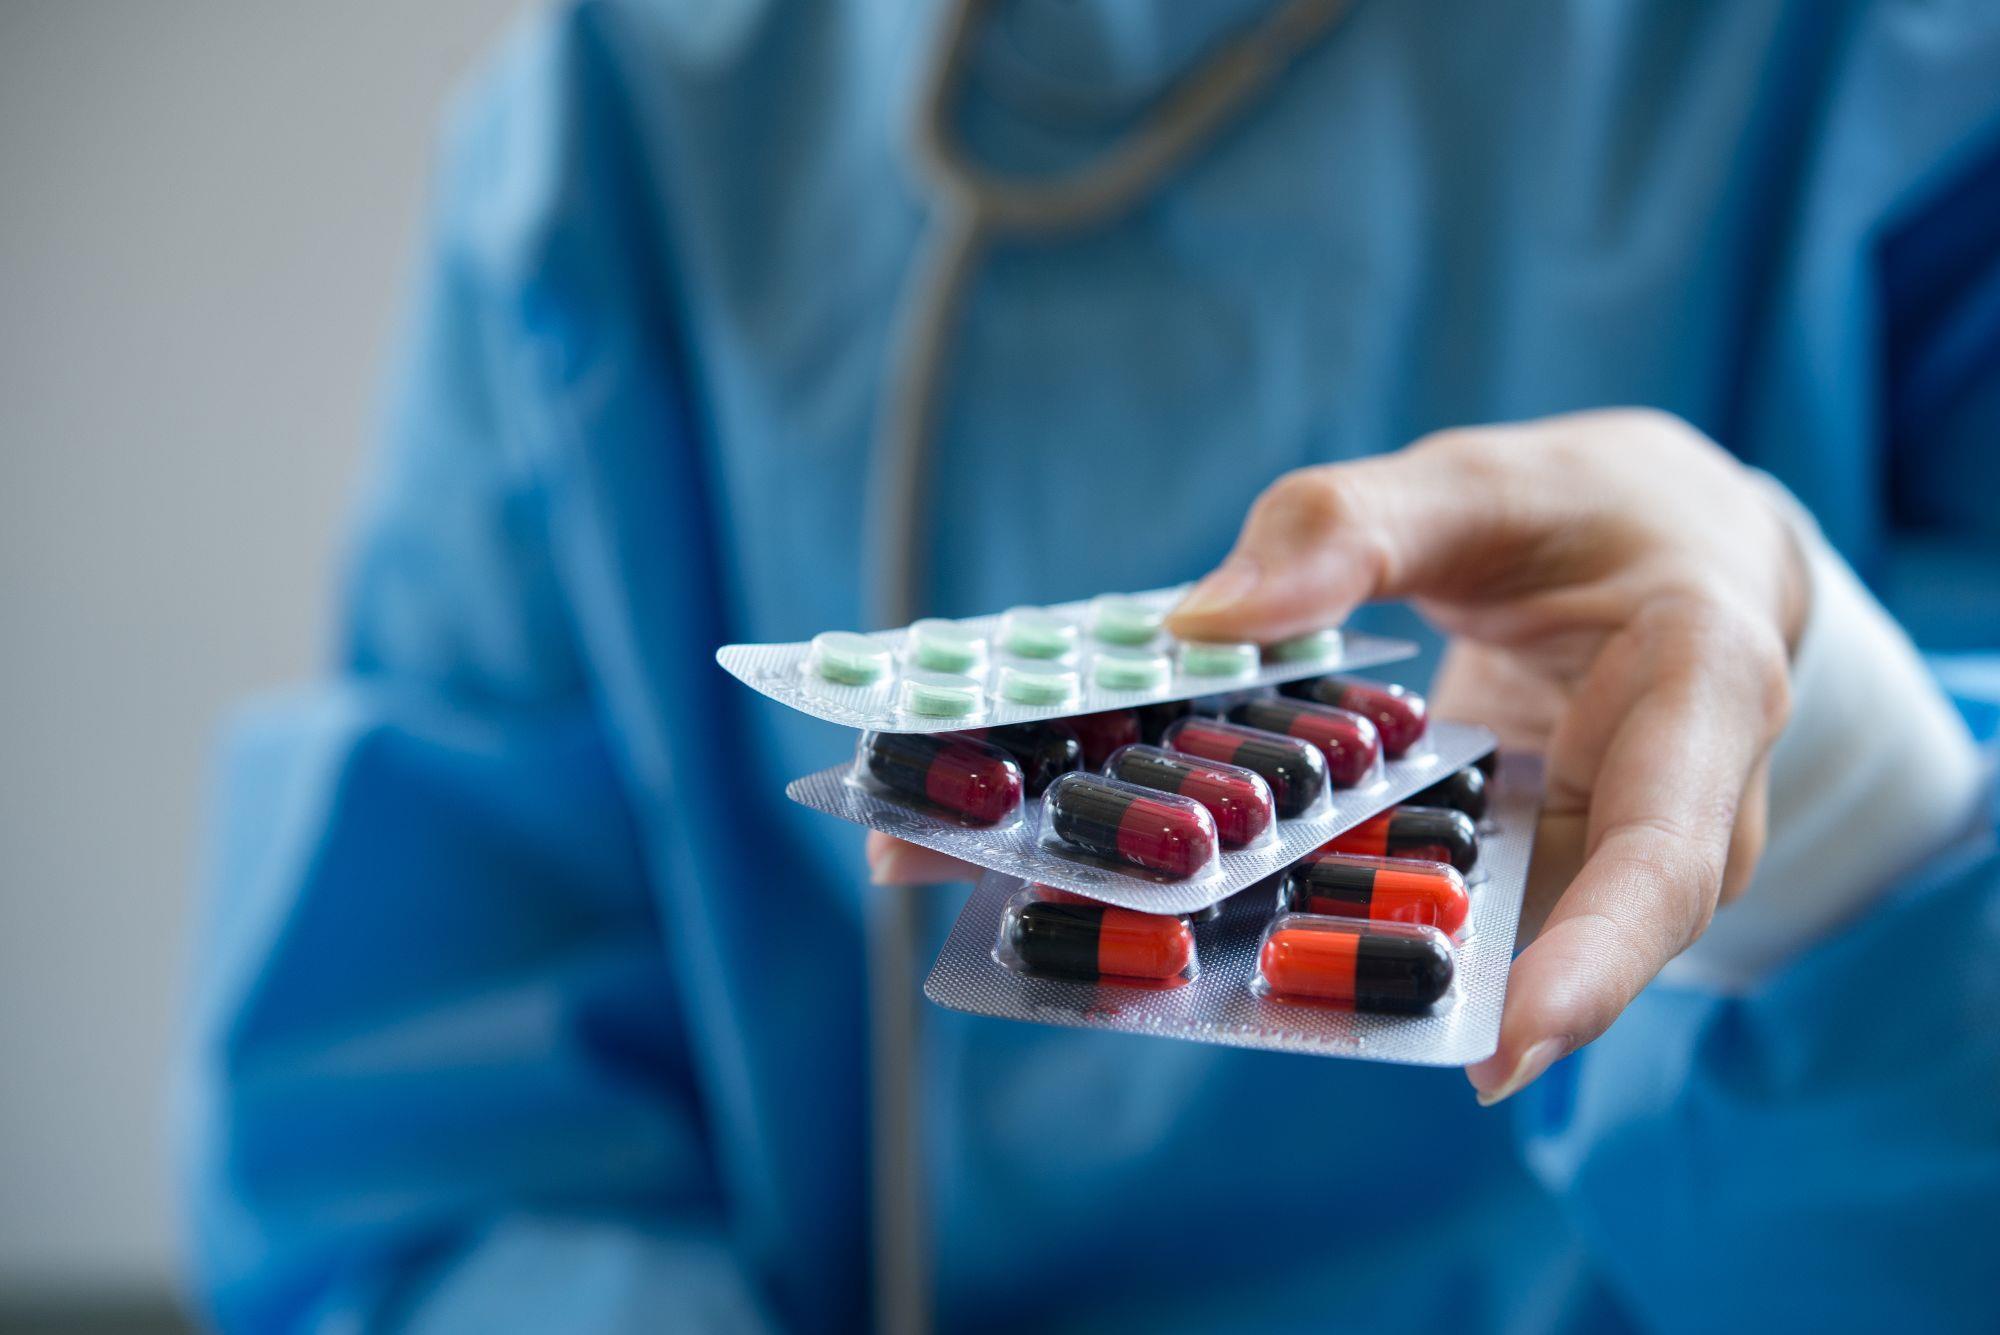 kit, covid, remédio, medicamento, sorocaba,, Banco de Imagens/Freepik